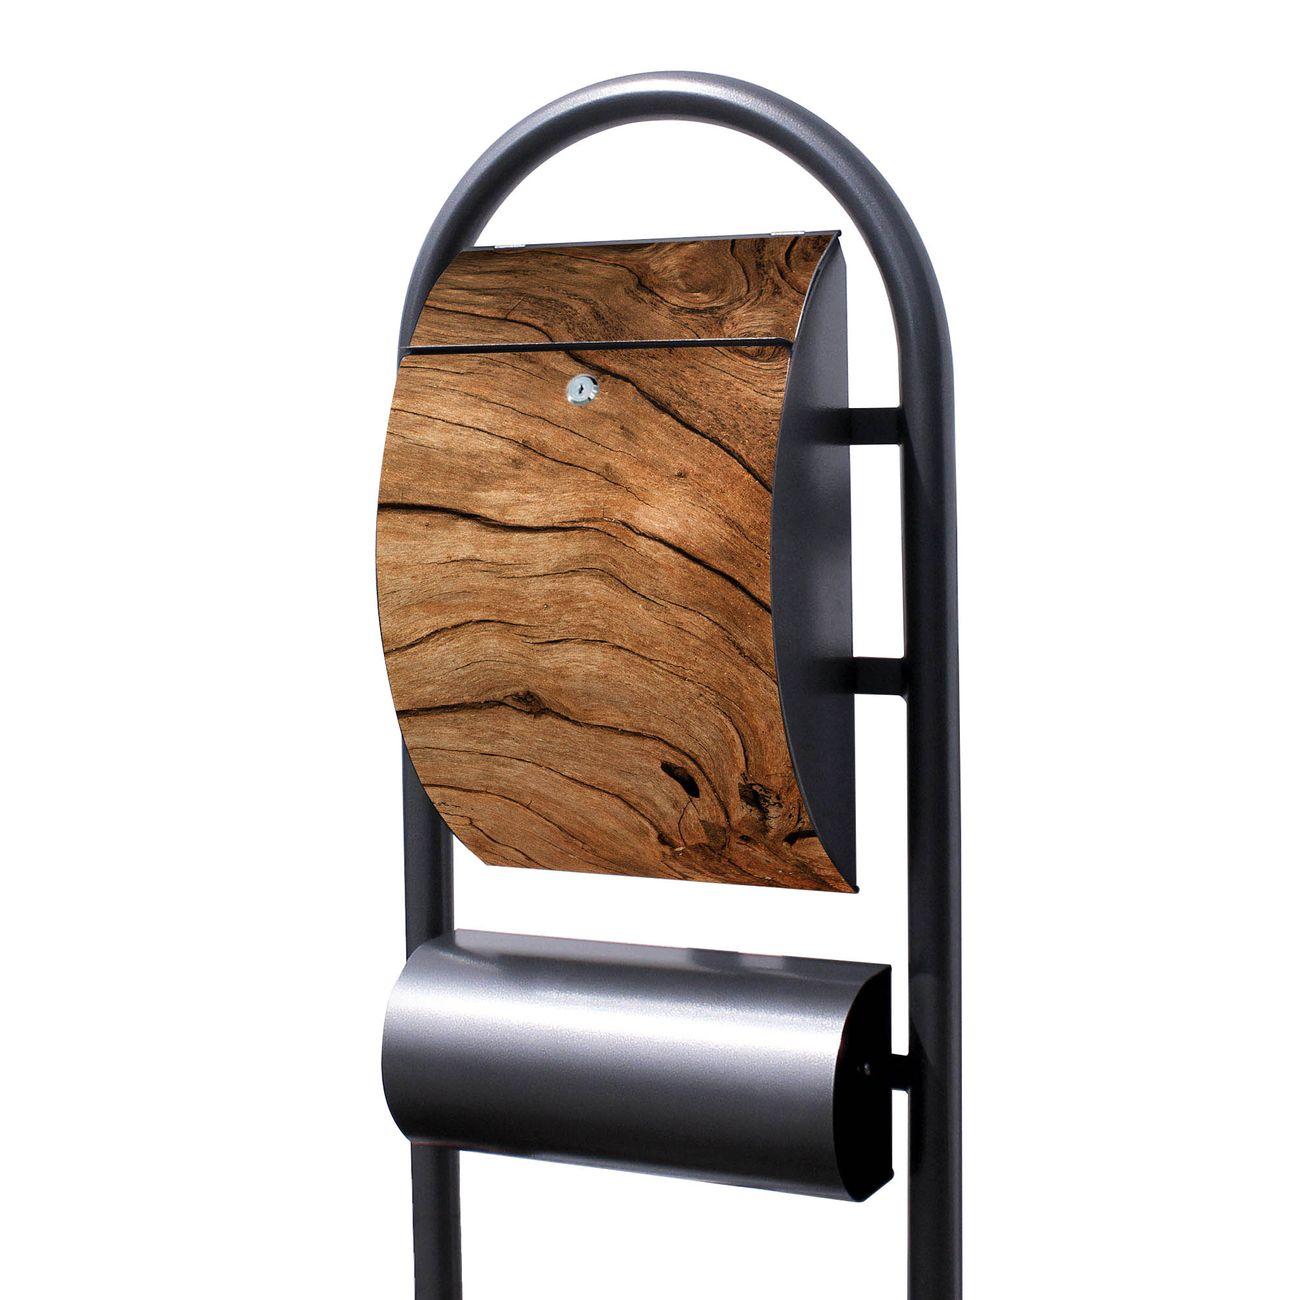 Standbriefkasten Hammerschlag Trockenes Holz